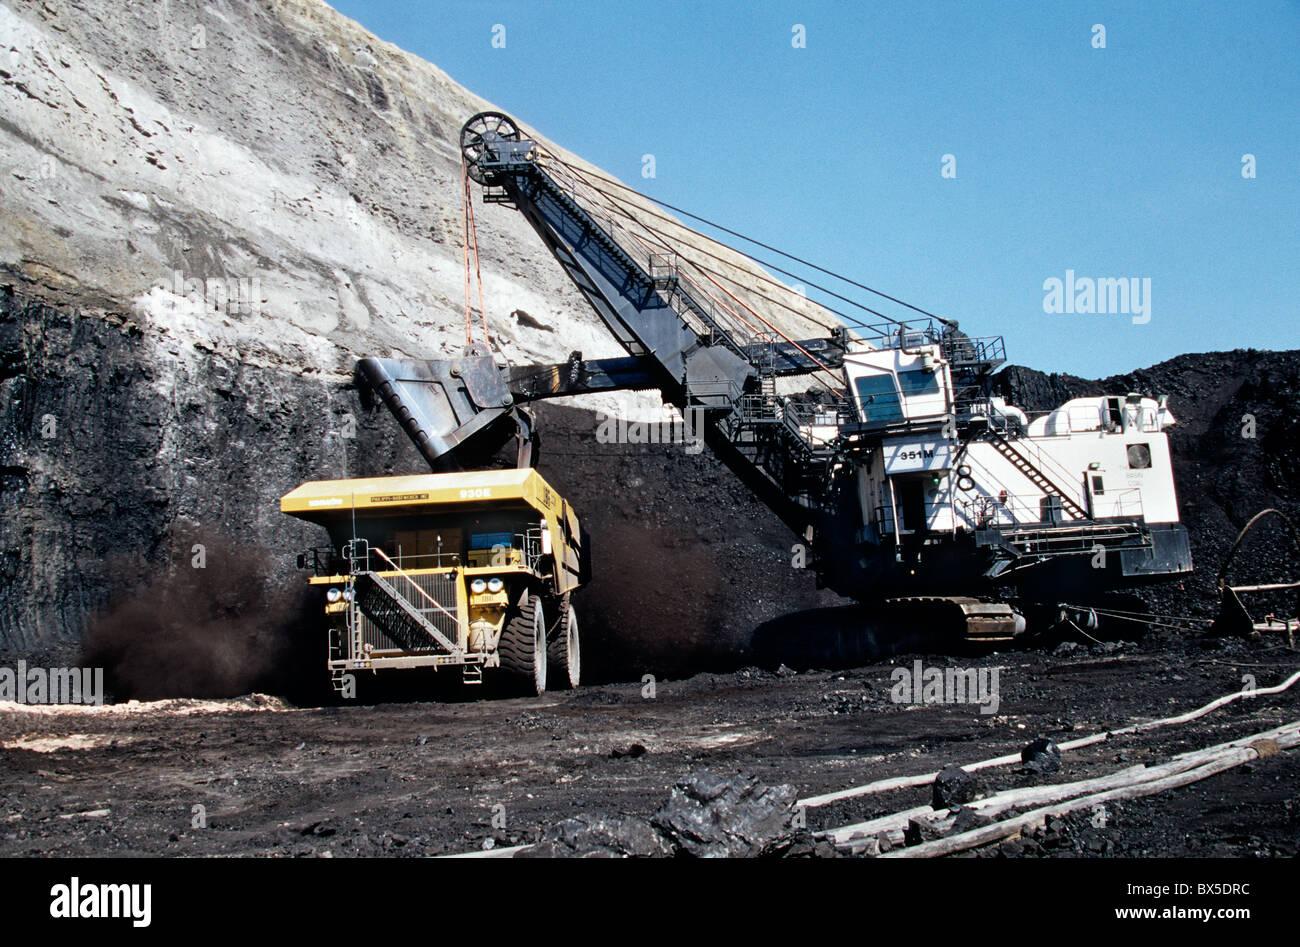 Coal, surface mine, P & H Electric shovel loading rough service dump truck. - Stock Image